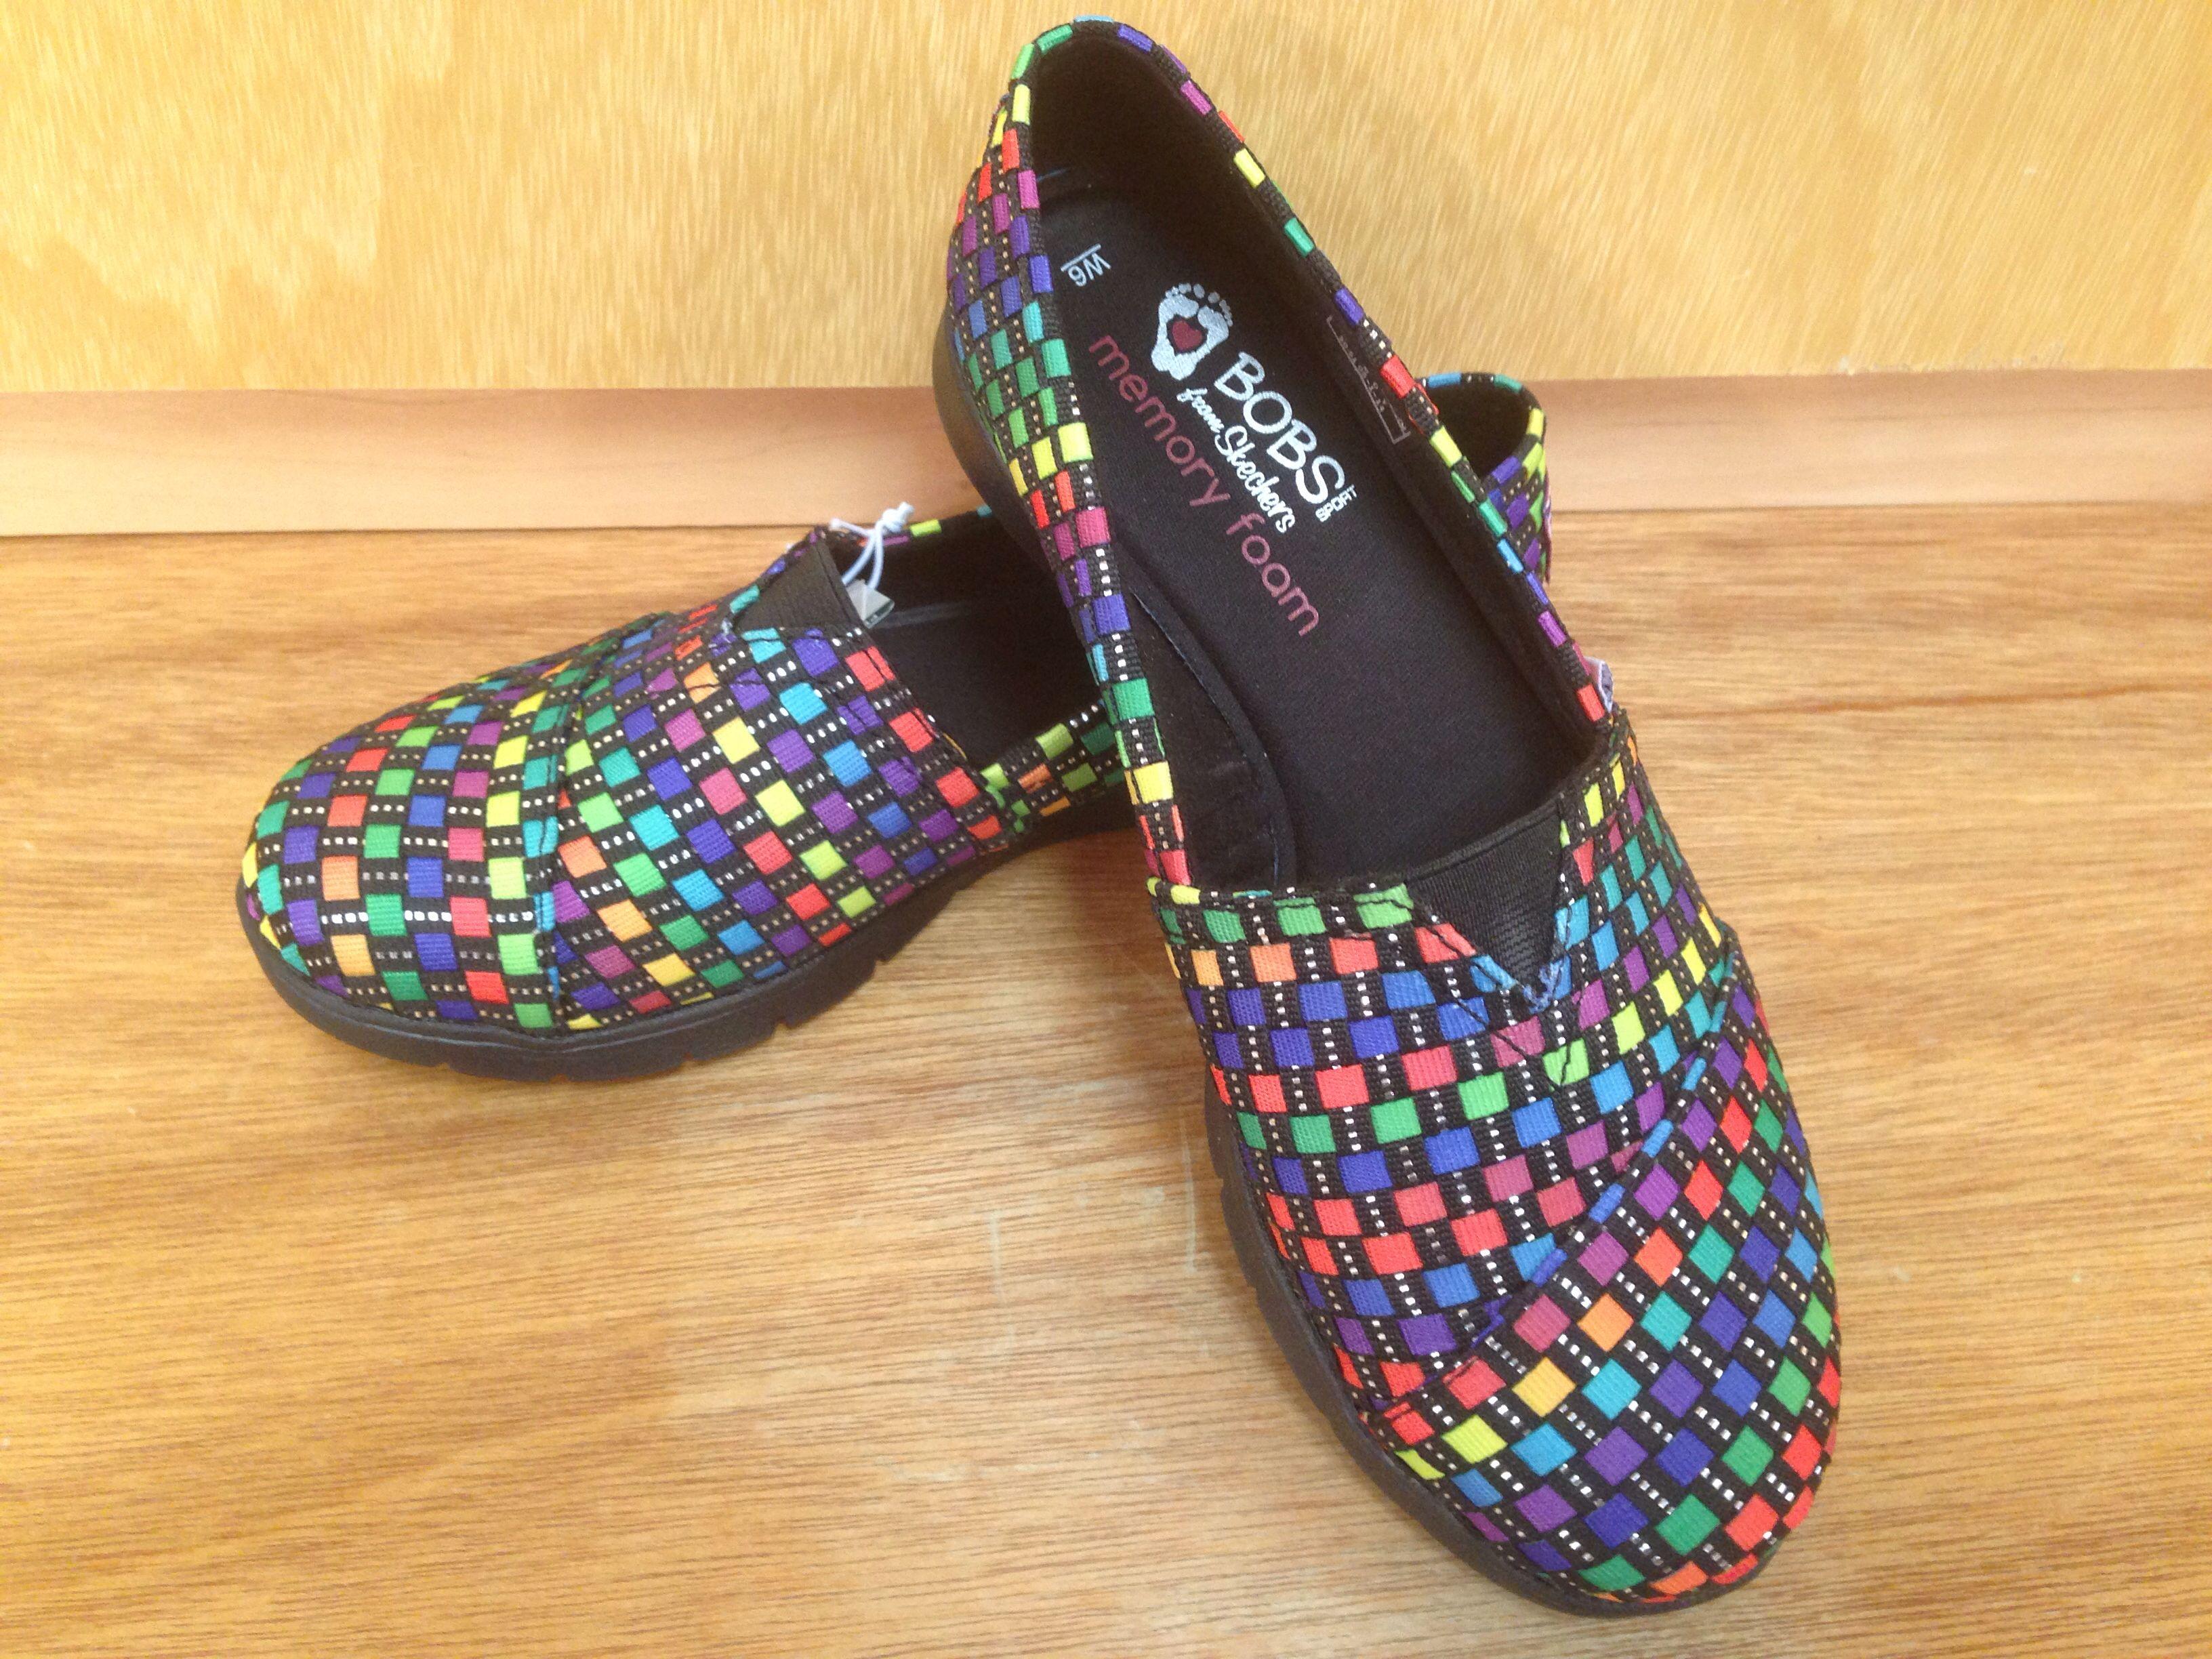 Skechers bobs, Bob shoes